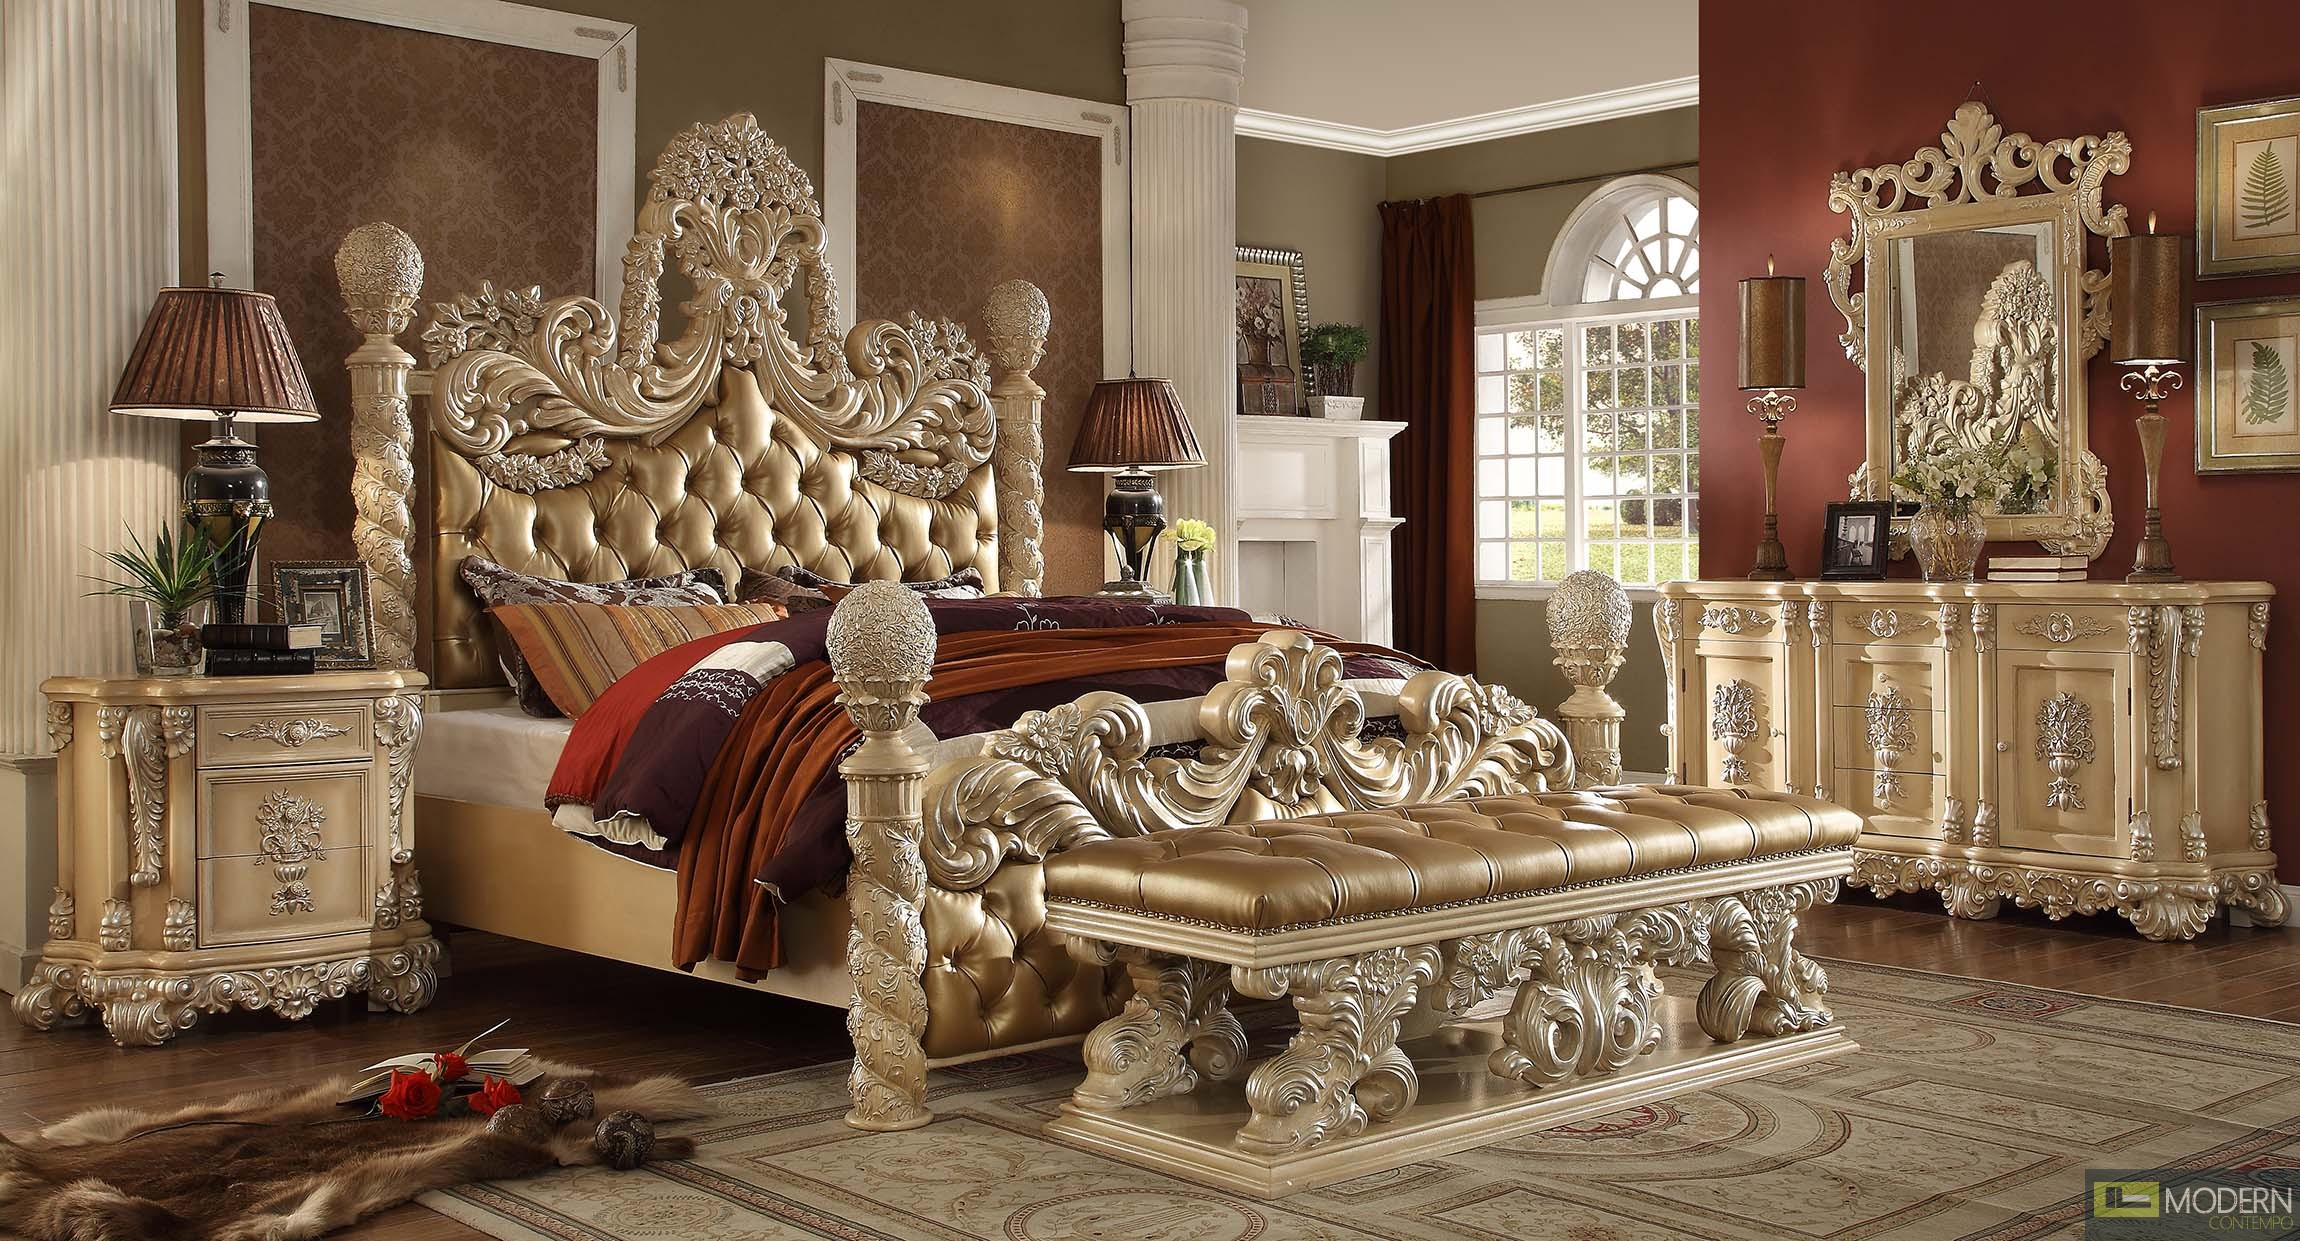 Nefertit European Style Luxury King Bed